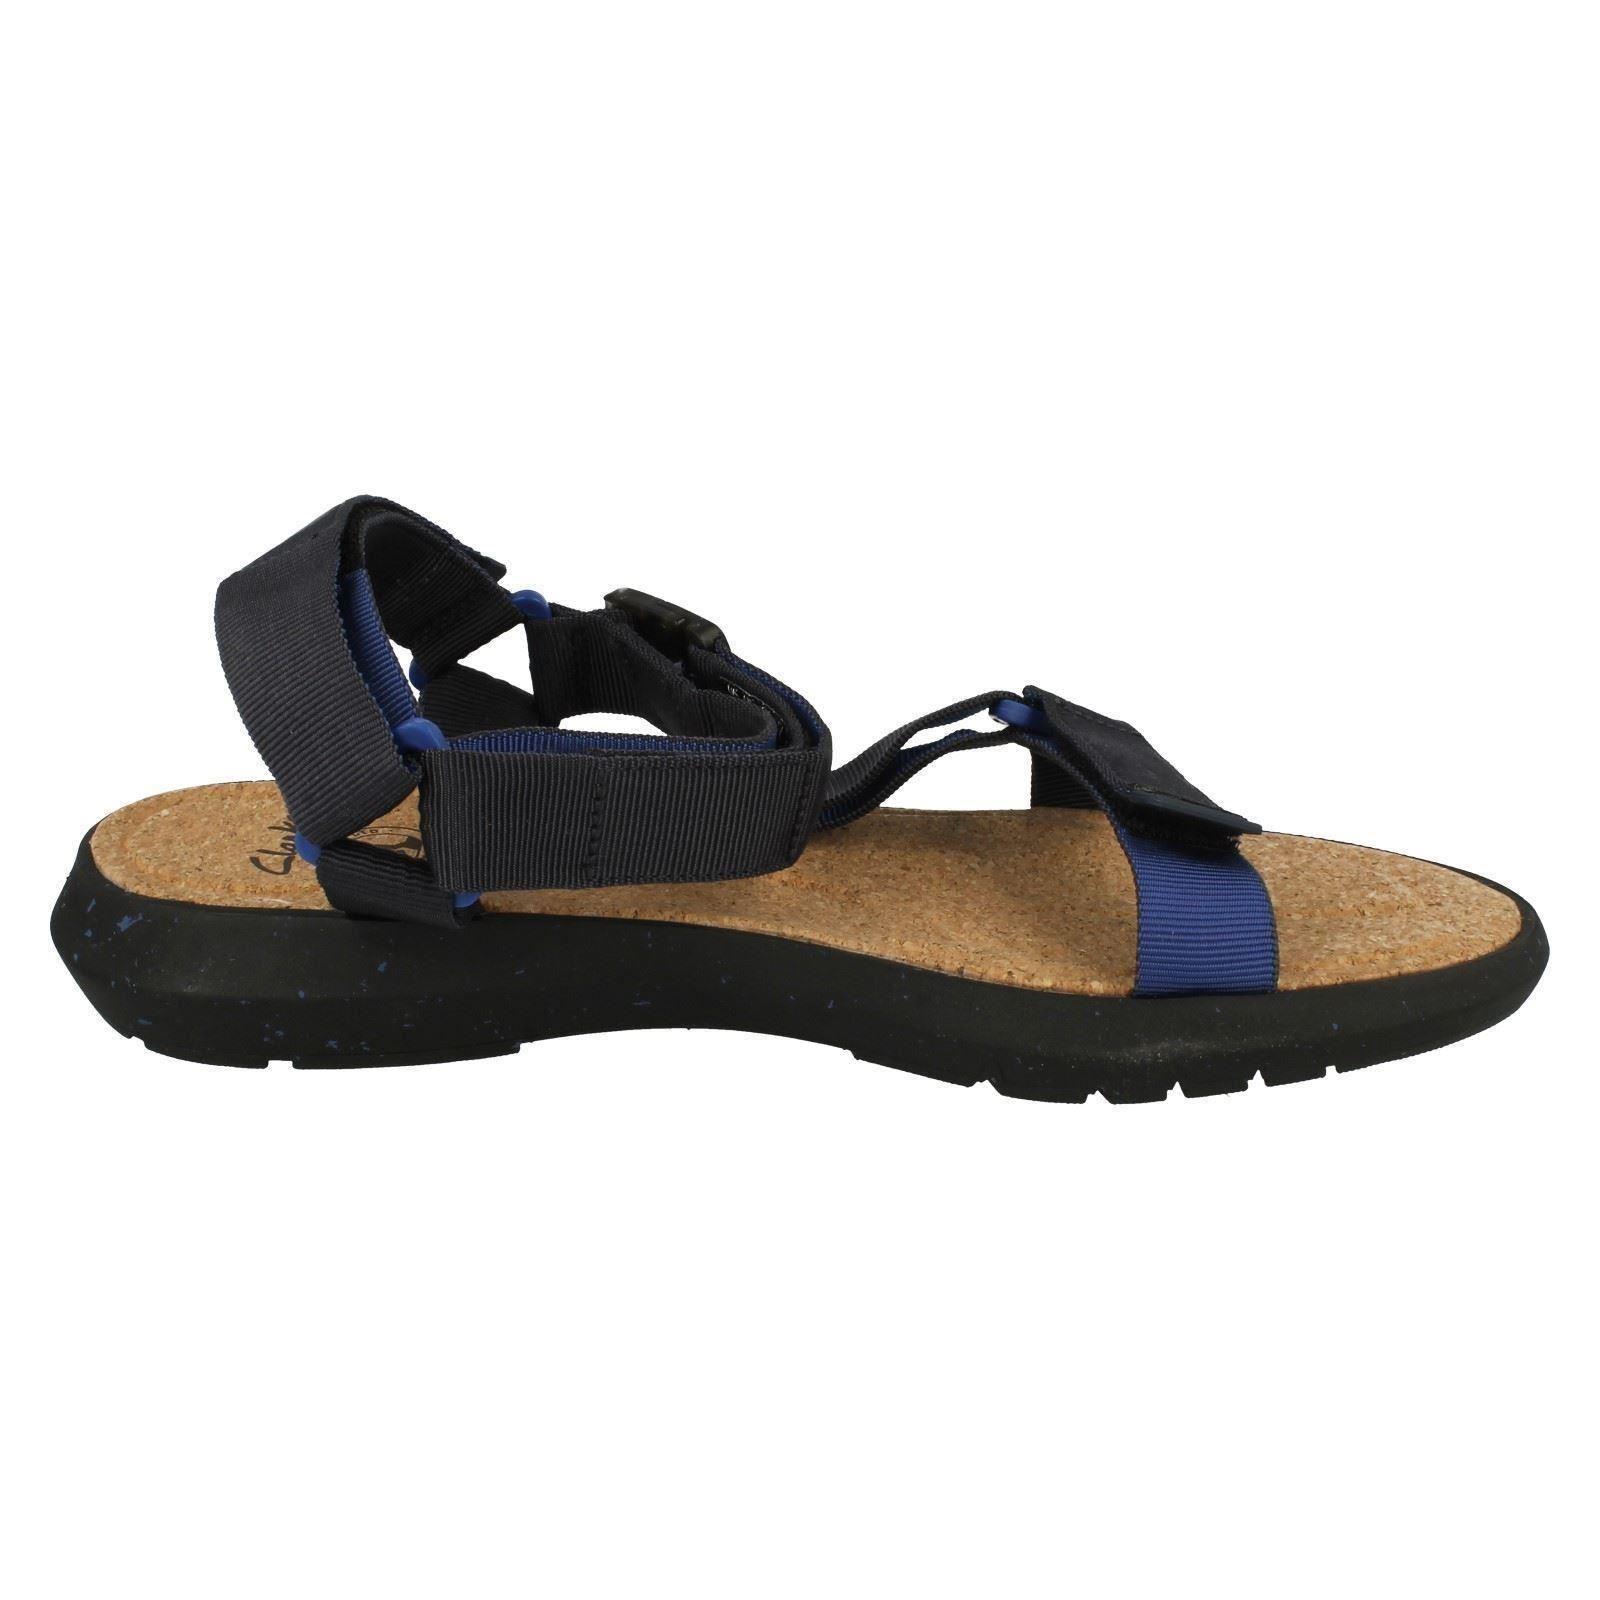 Men's Clarks Style Casual Sandales Style Clarks - Pilton Brave 619013